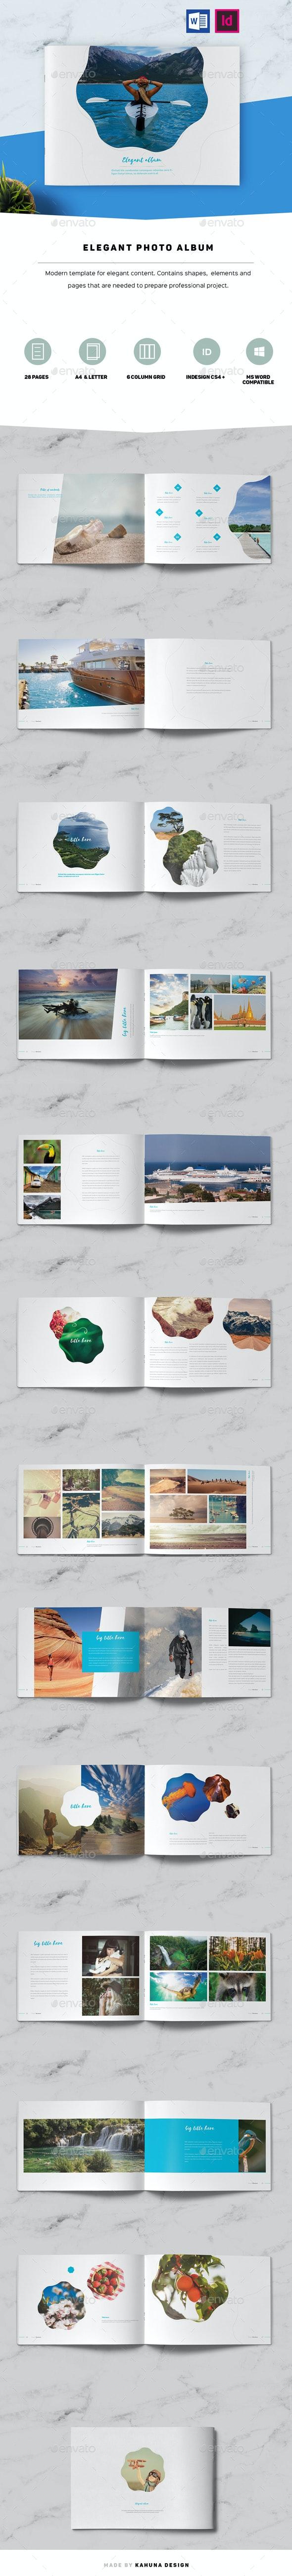 Elegant Photo Album - Photo Albums Print Templates